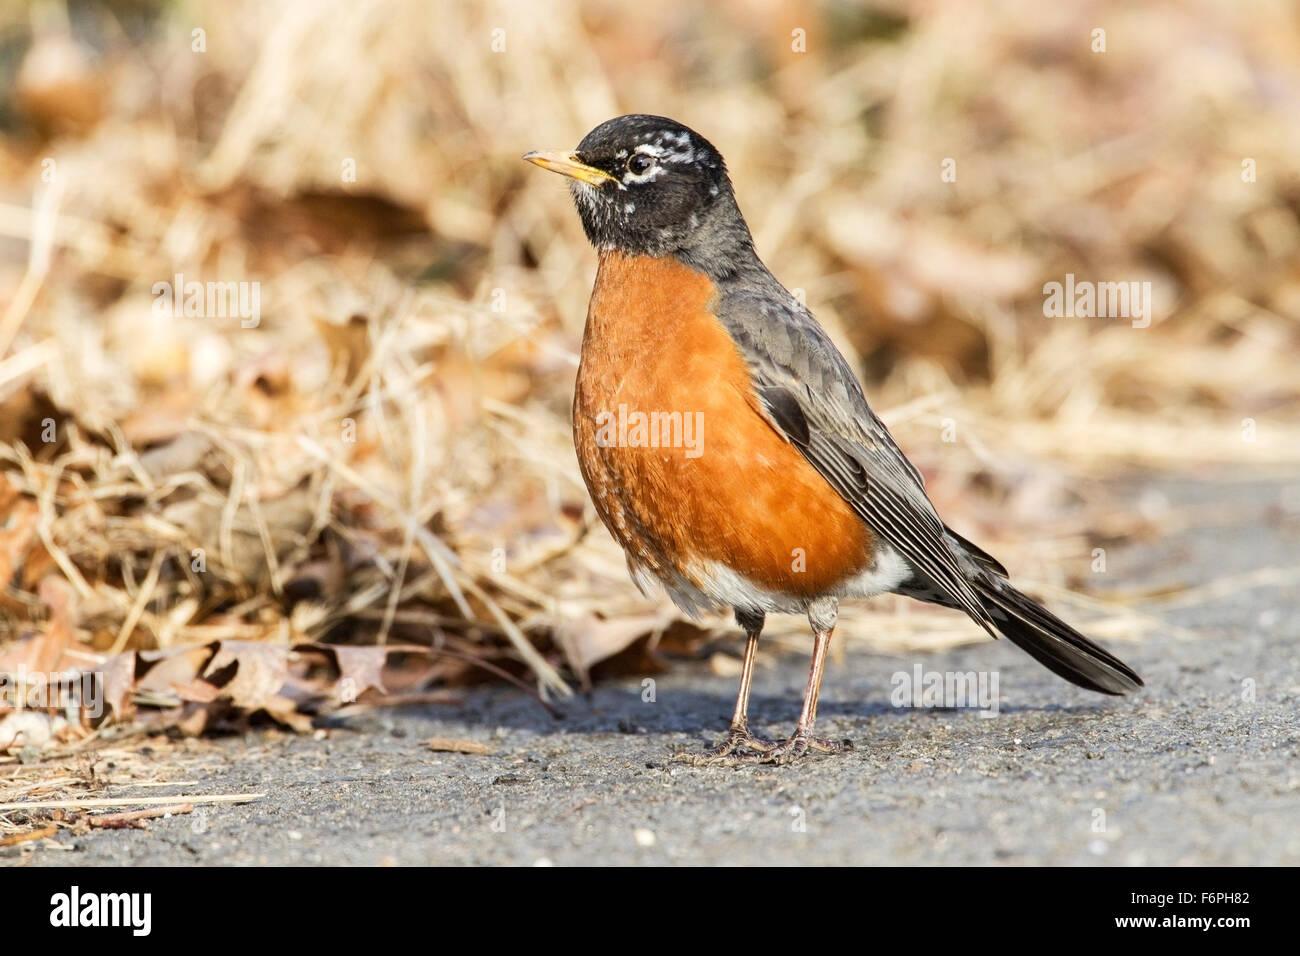 American robin, adult standing on ground near grass, Washington, USA Stock Photo